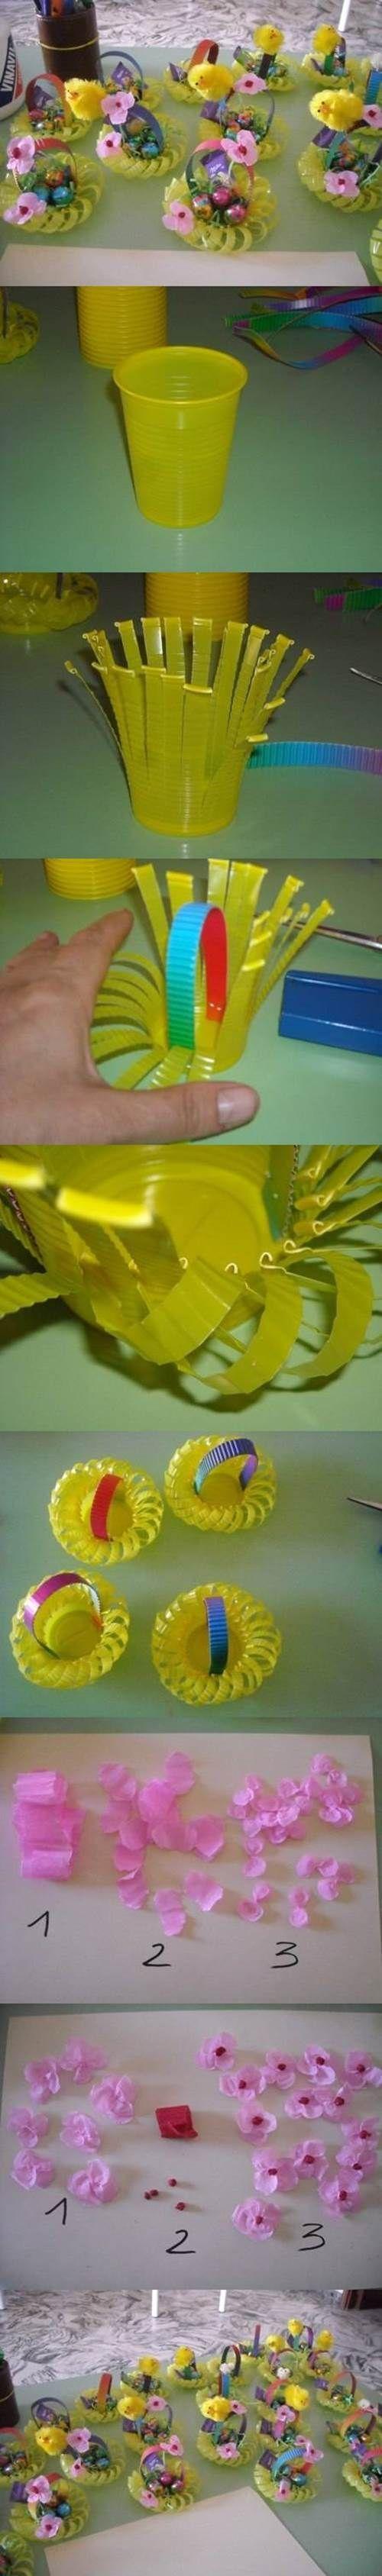 DIY Plastic Cup Easter Basket | iCreativeIdeas.com Like Us on Facebook ==> https://www.facebook.com/icreativeideas